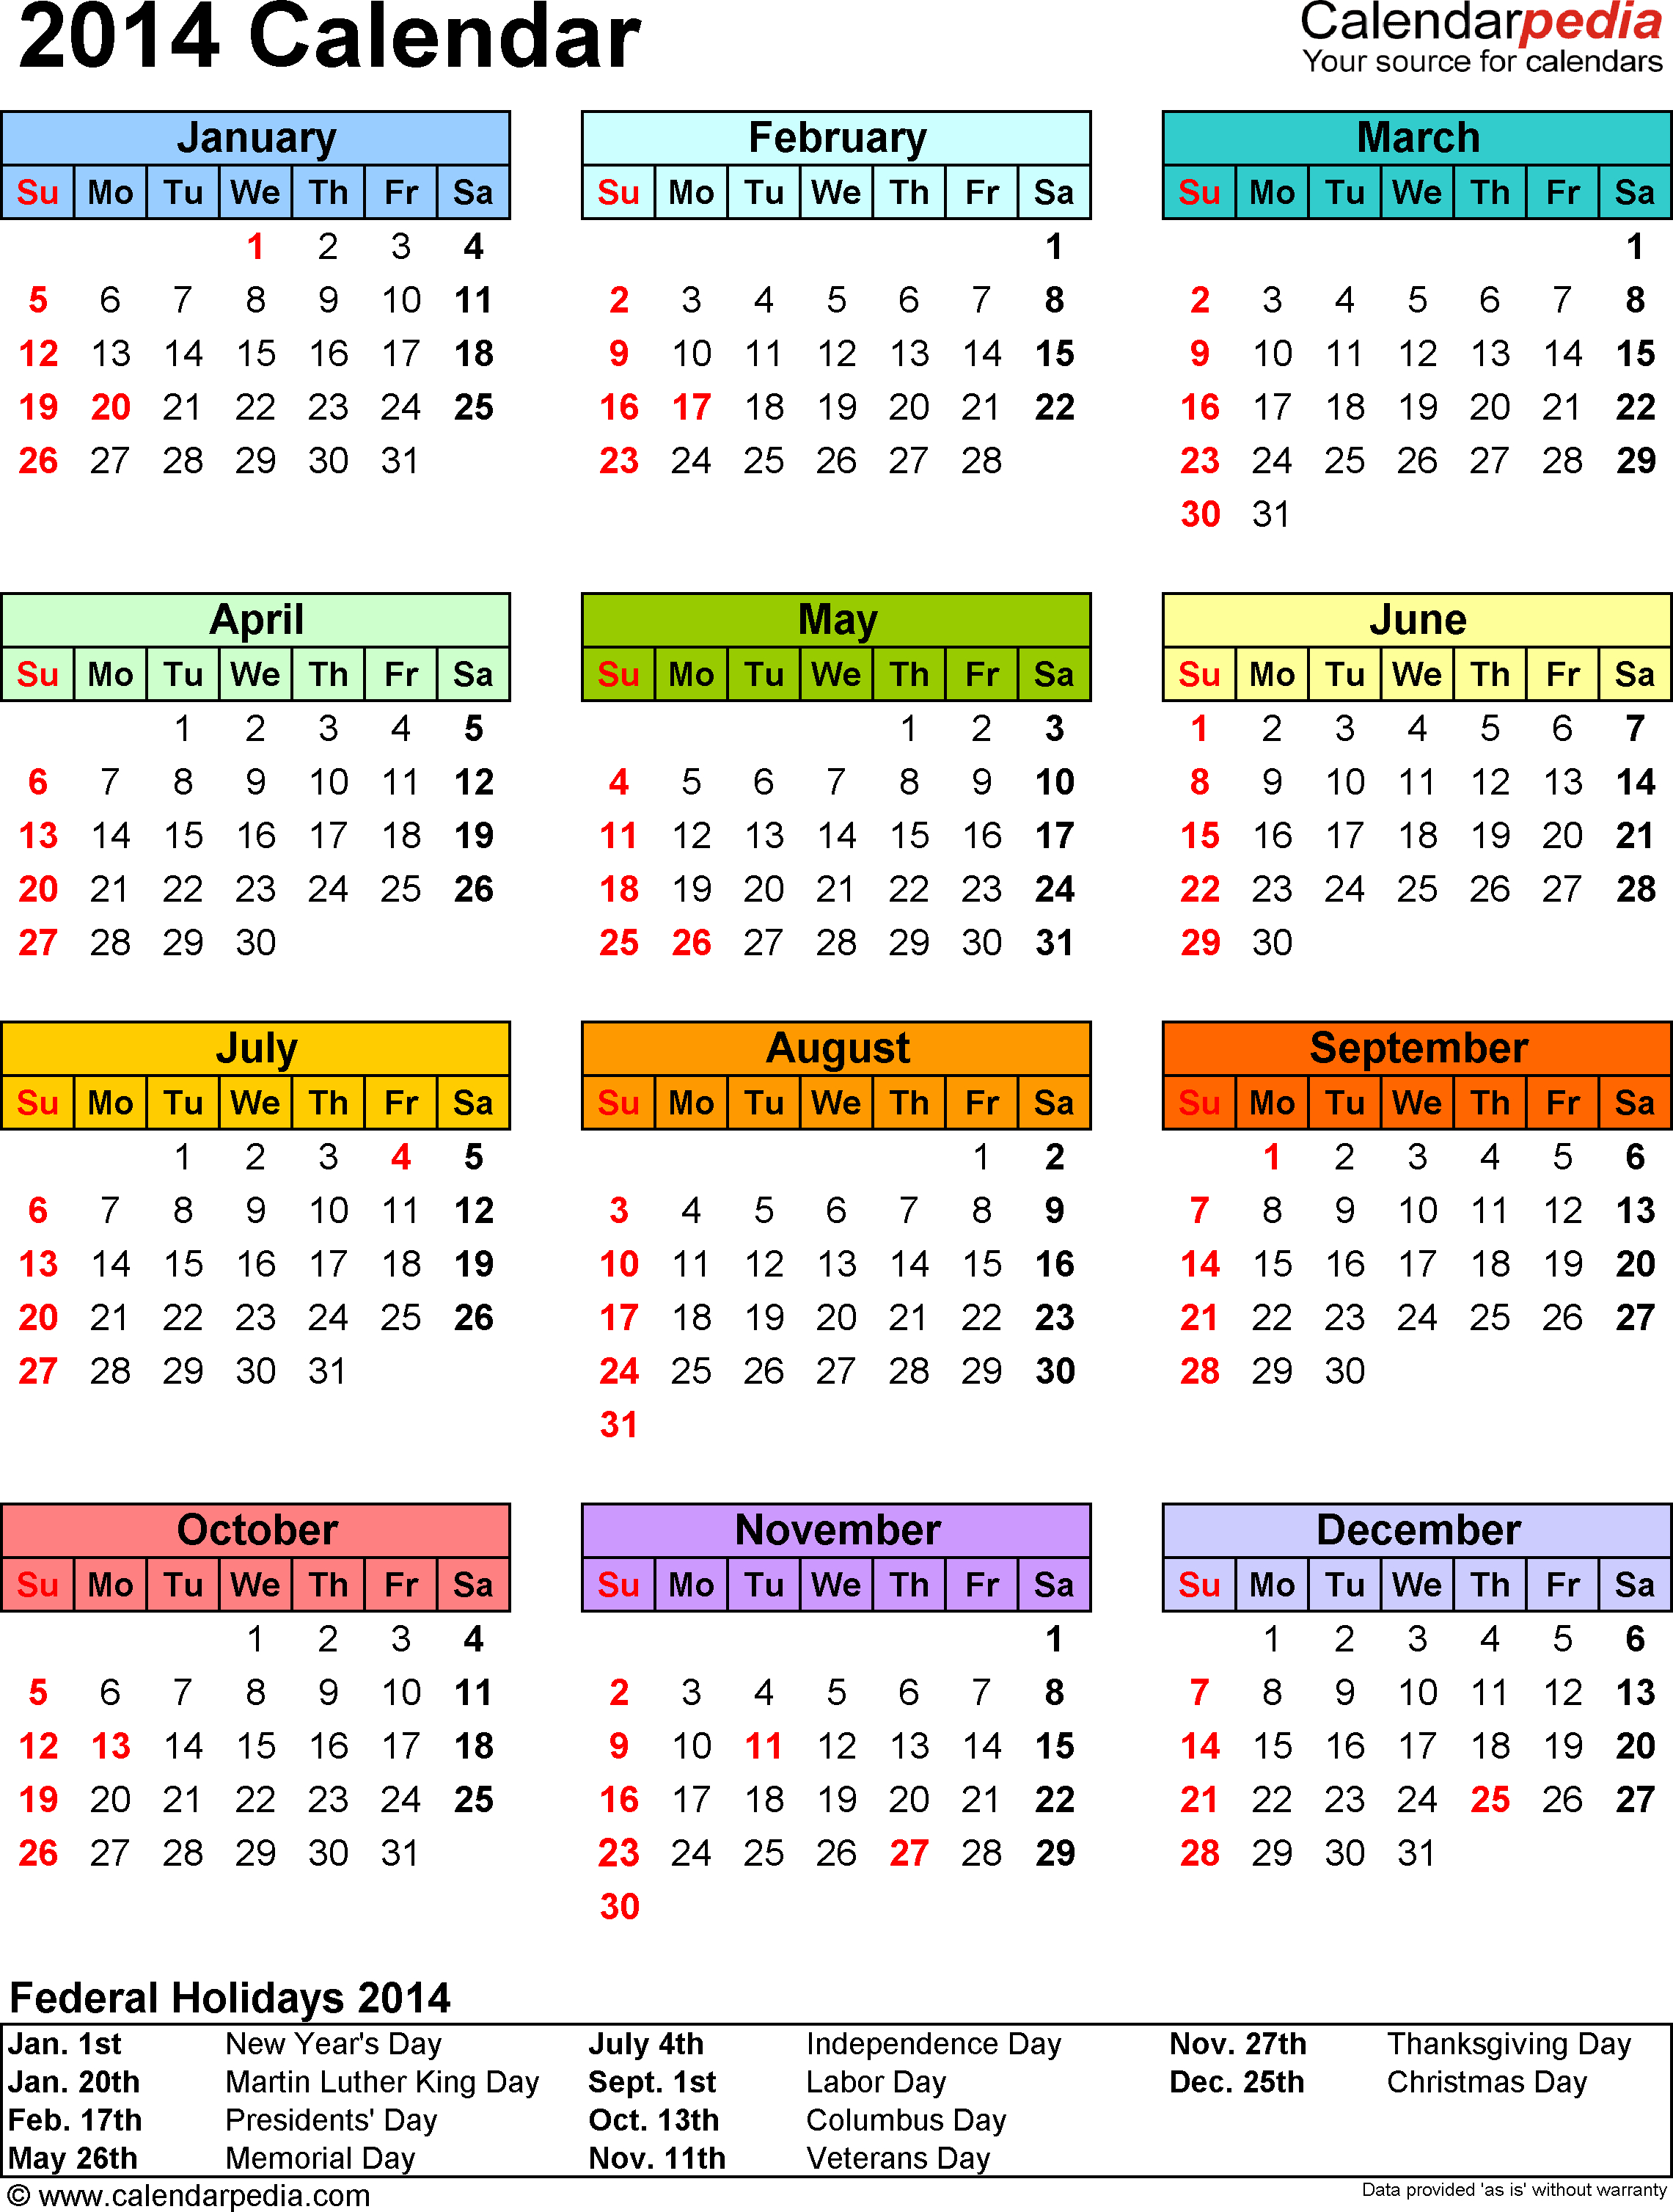 2014 Calendar - 13 Free Printable Word Calendar Templates pertaining to 2014 12 Month Blank Calendar